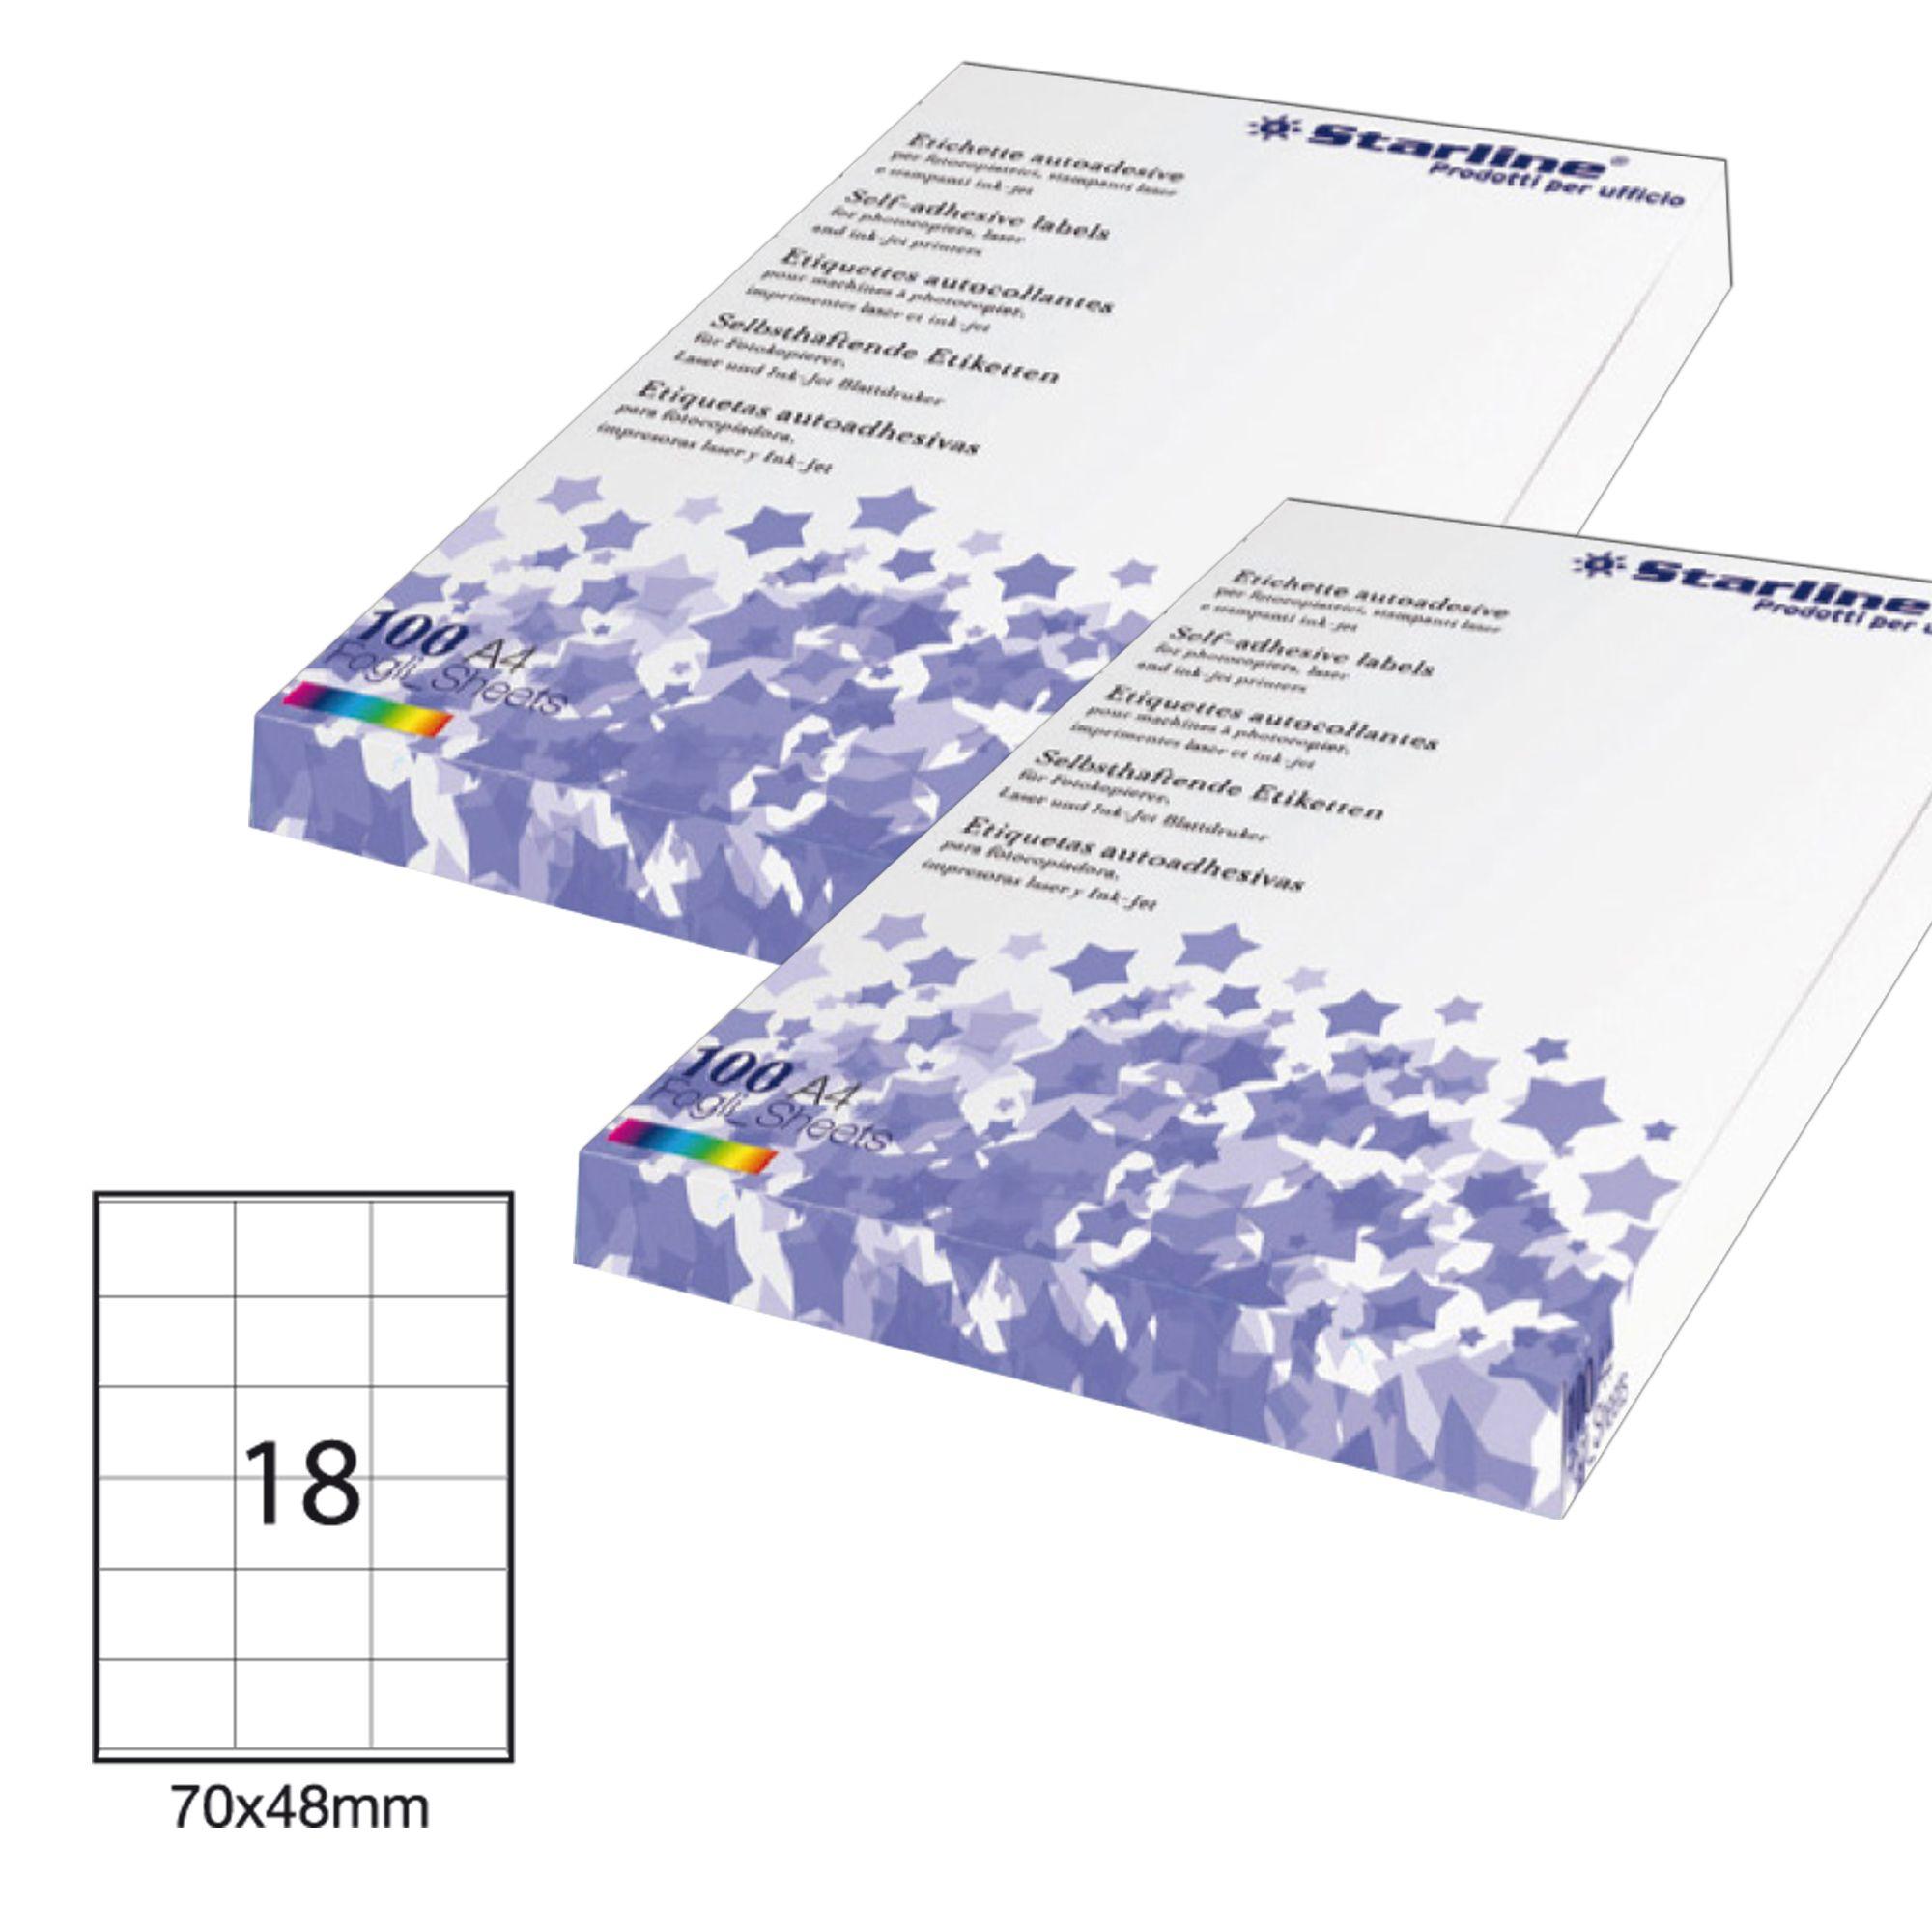 Etichetta adesiva bianca 100fg a4 70x48mm (18et - fg) starline STL3026 8025133013750